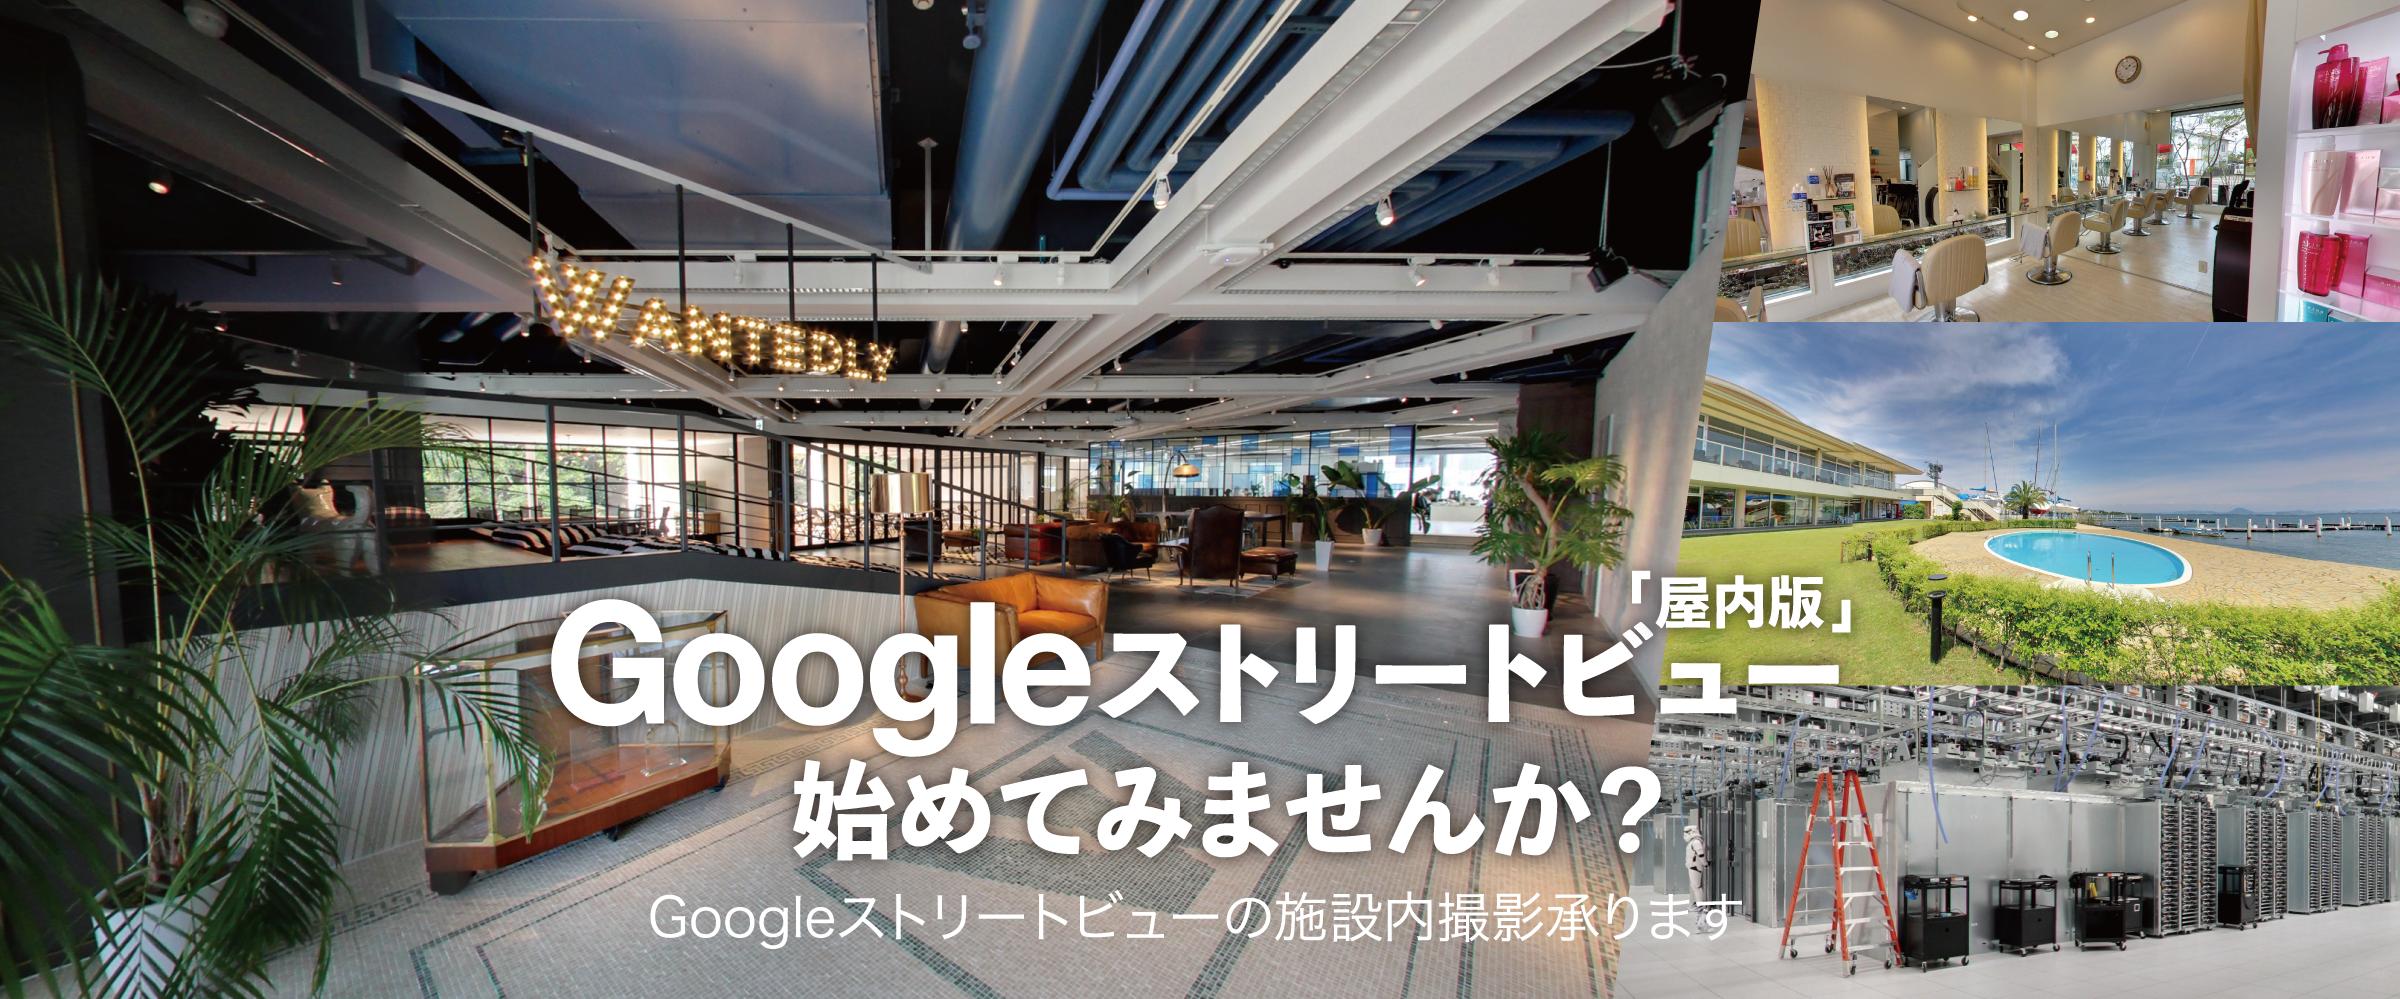 Googleストリートビュー屋内版事業